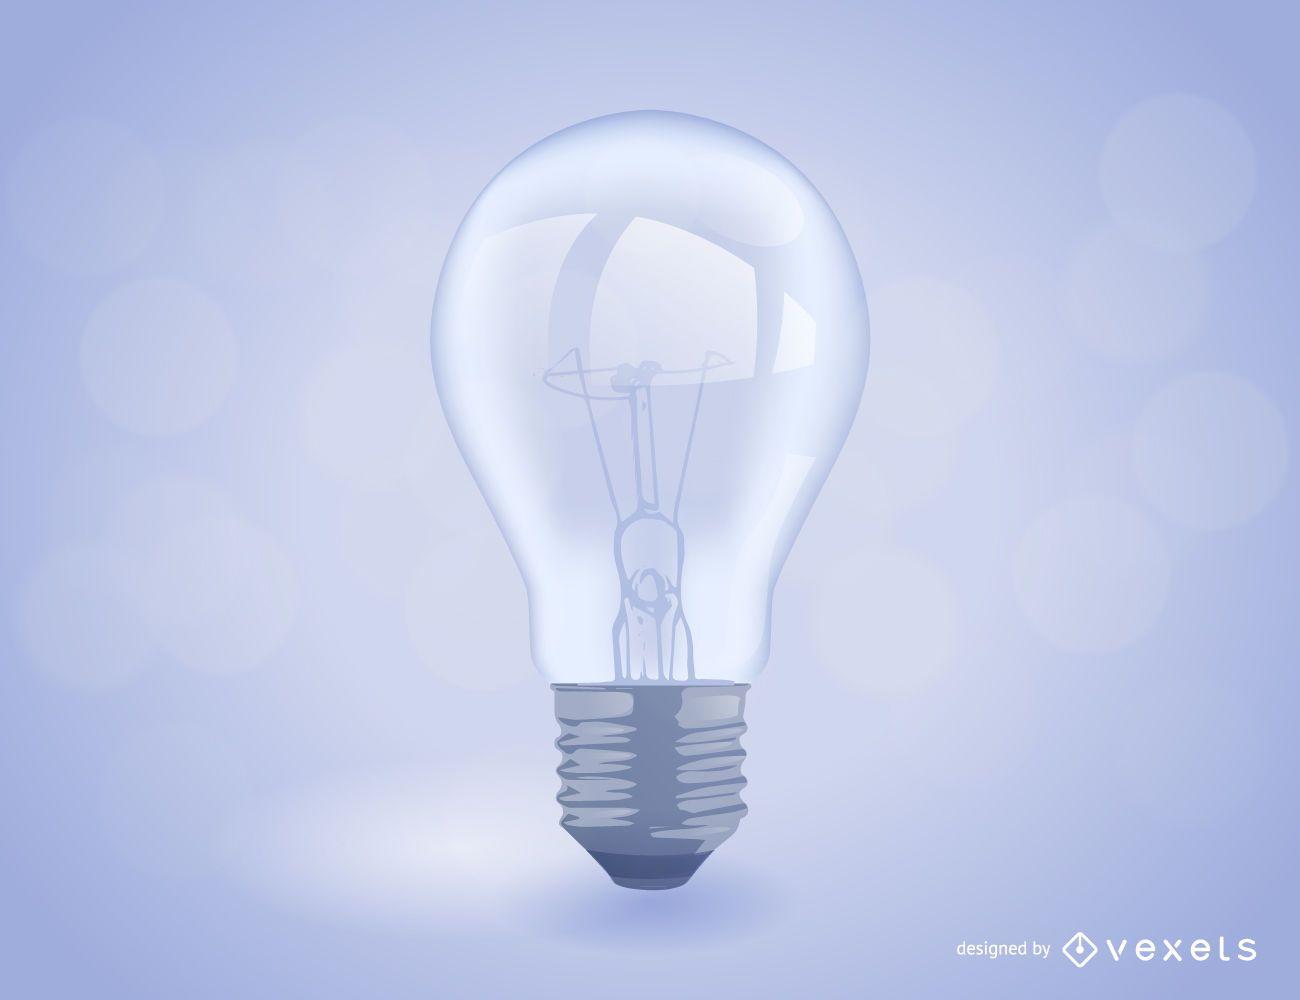 Realistic light bulb illustration